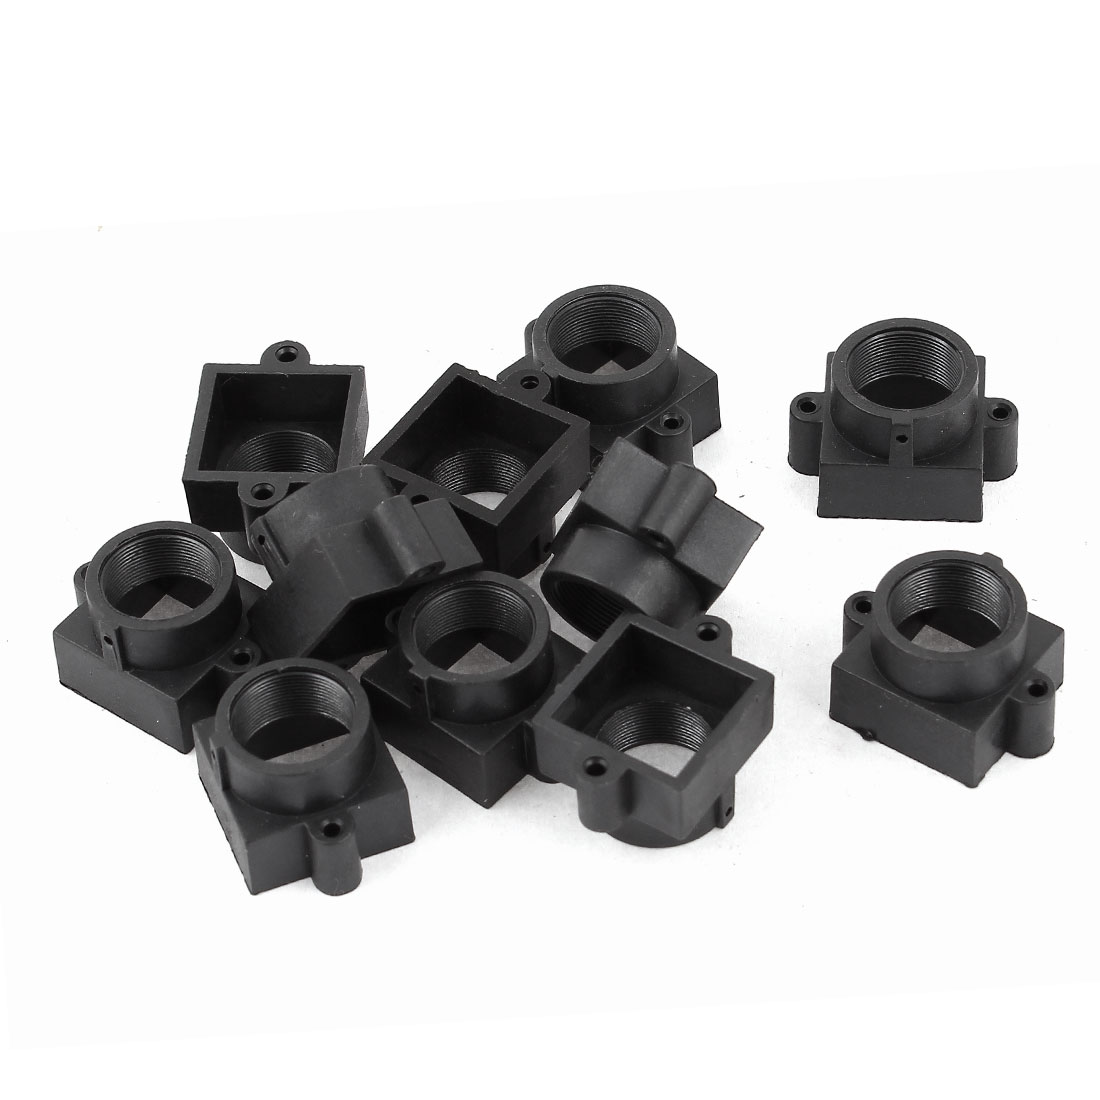 10 Pcs Black Plastic M12 20mm Hole Spacing Security CCTV Camera Lens Holder